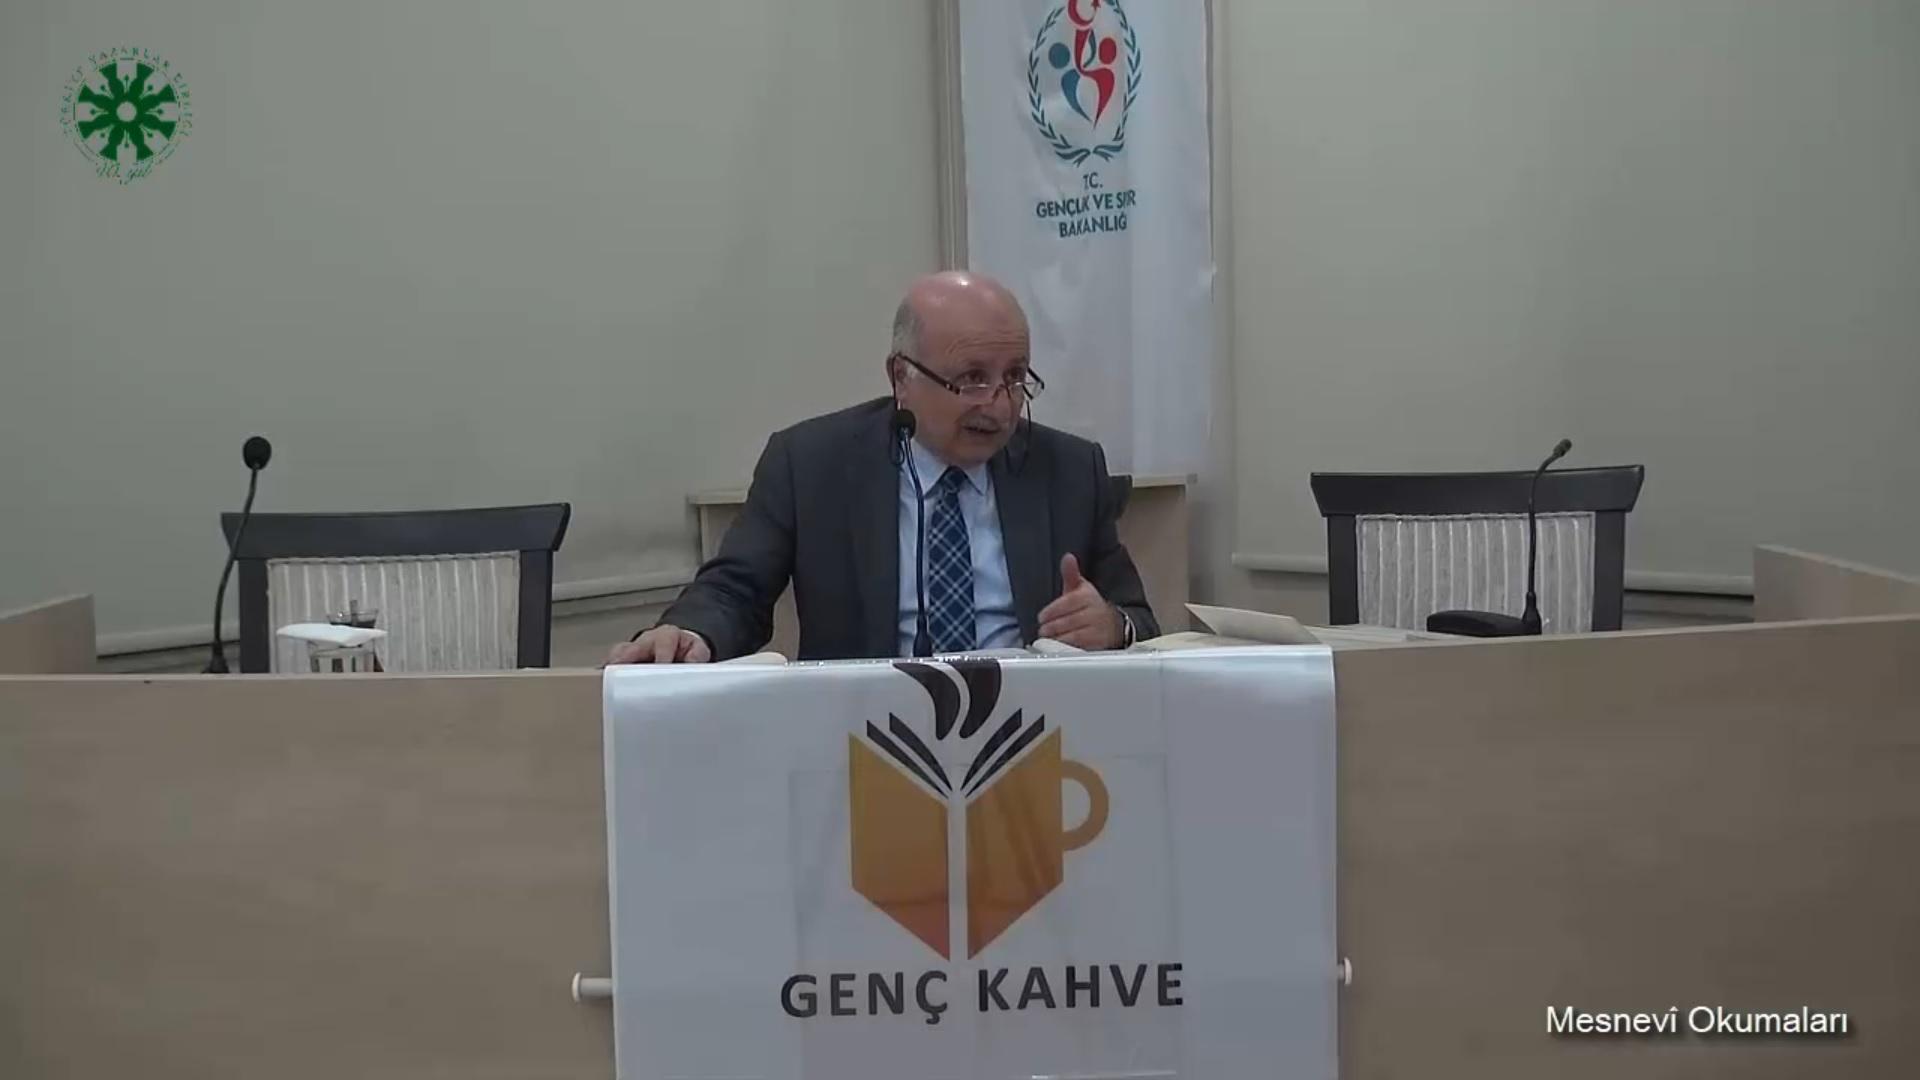 Mesnevî Okumaları - 15 - Prof. Dr. Adnan Karaismailoğlu (video)